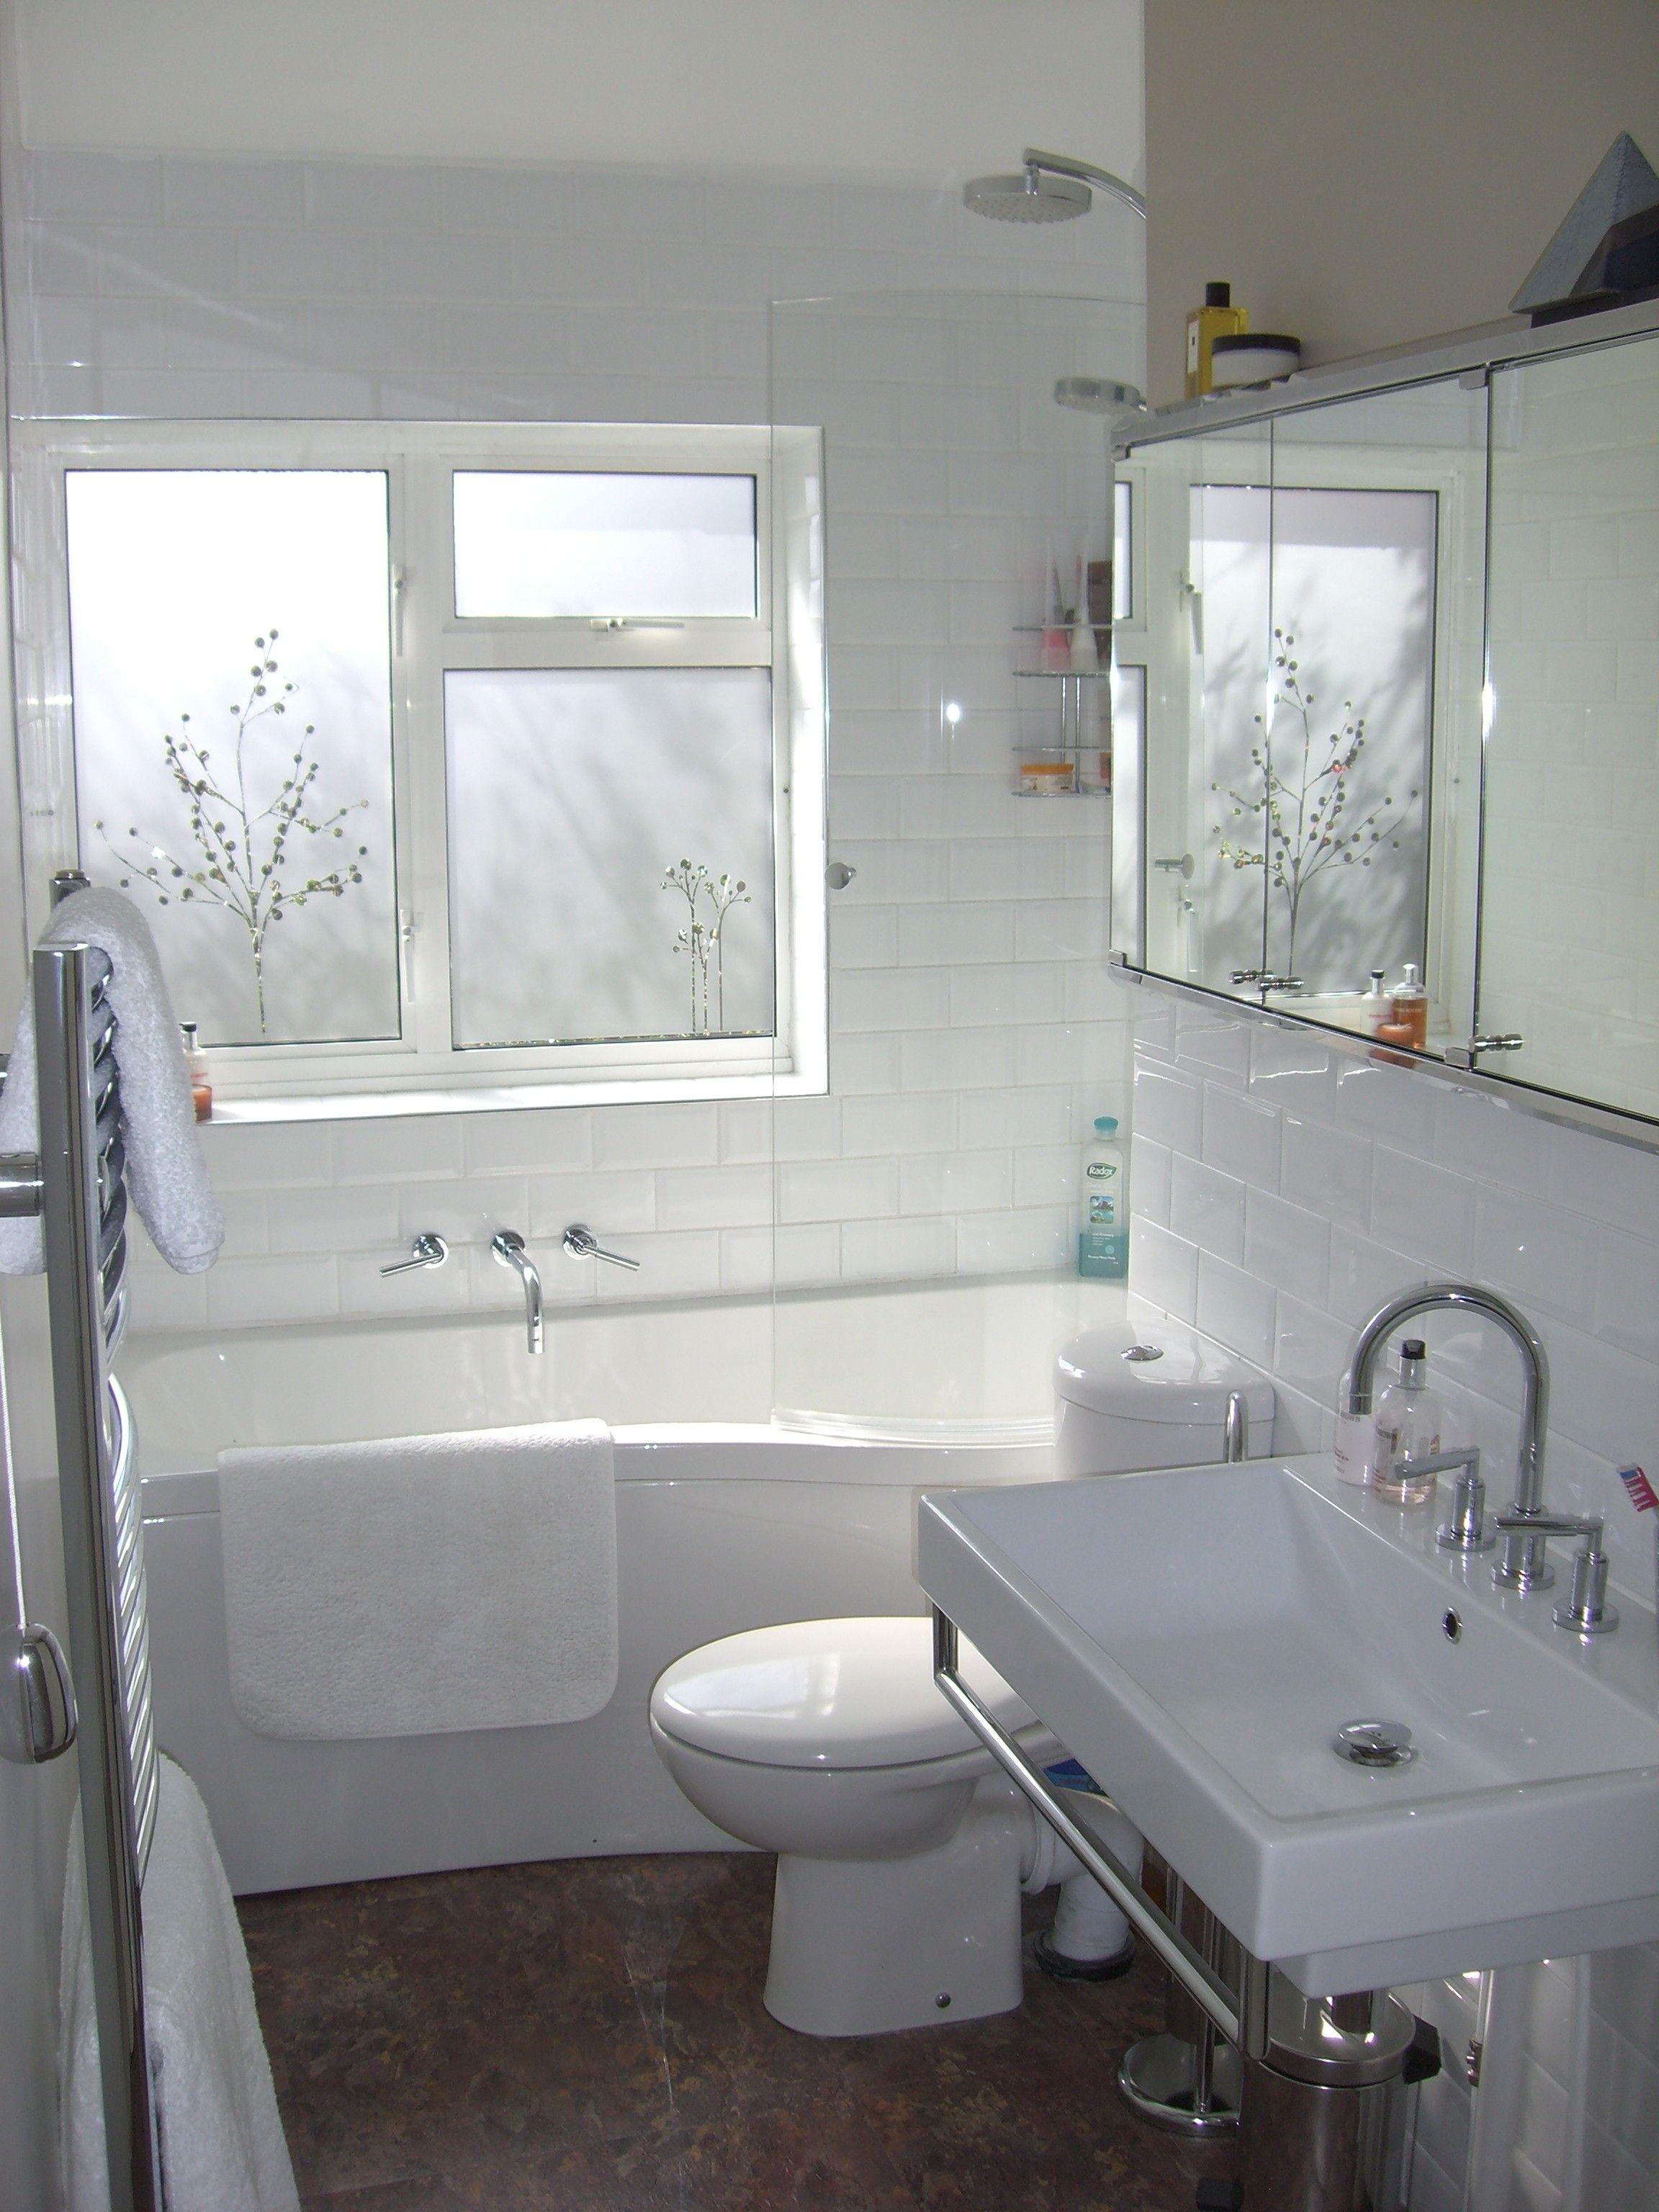 WhiteSmallBathroomRemodelingIdeas Badezimmer ohne